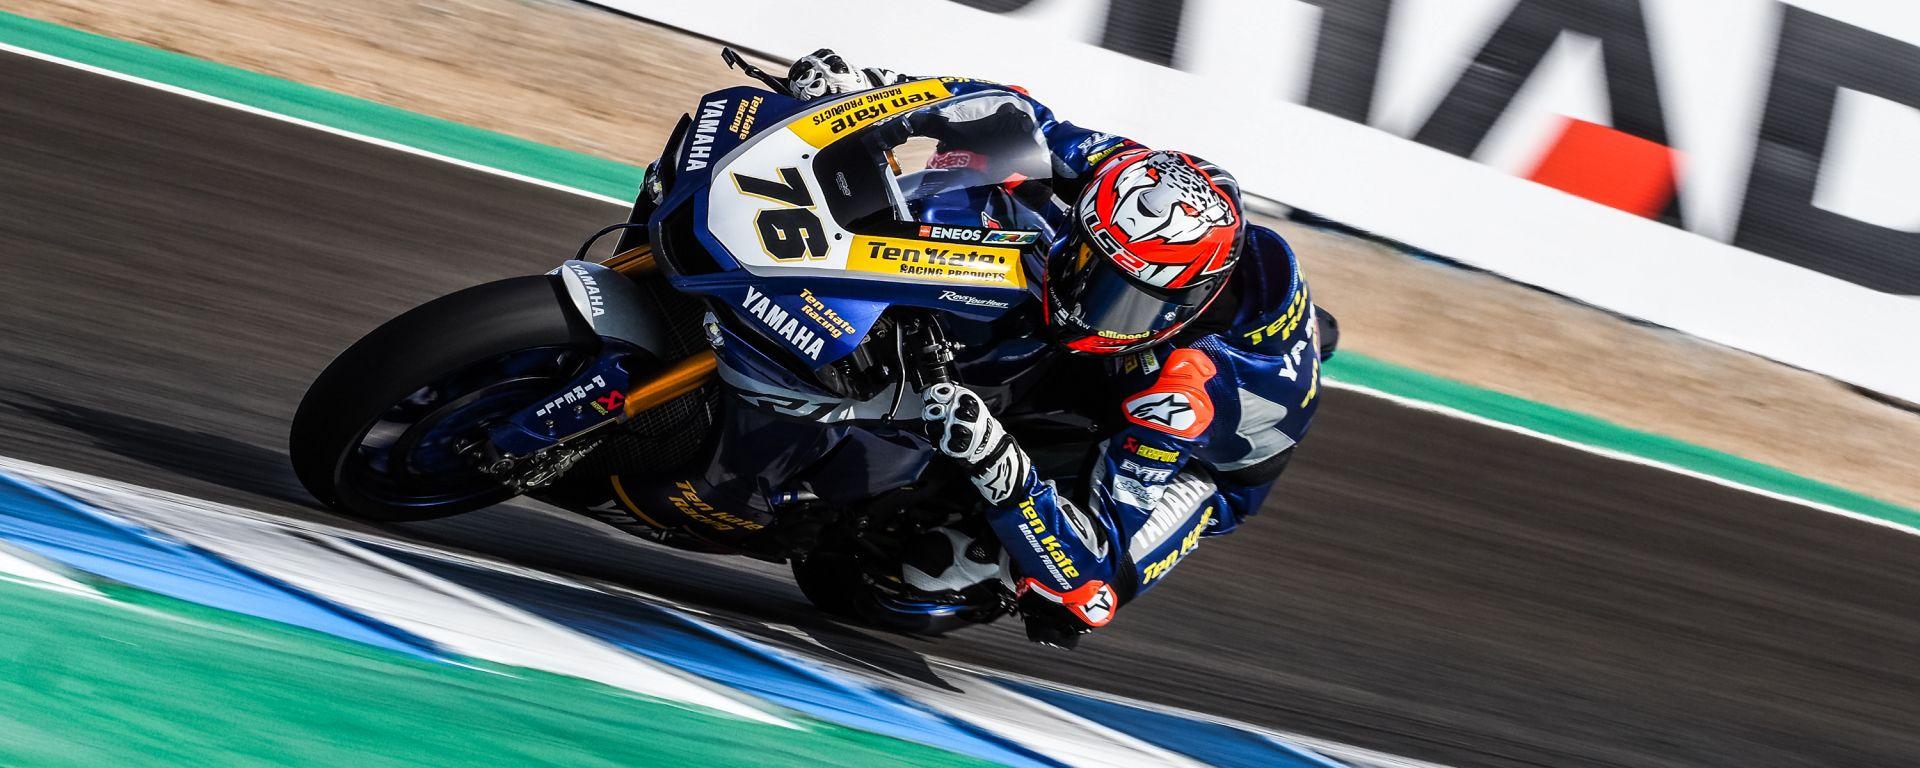 SBK 2020, Round Spagna, Jerez: Loris Baz (Yamaha)